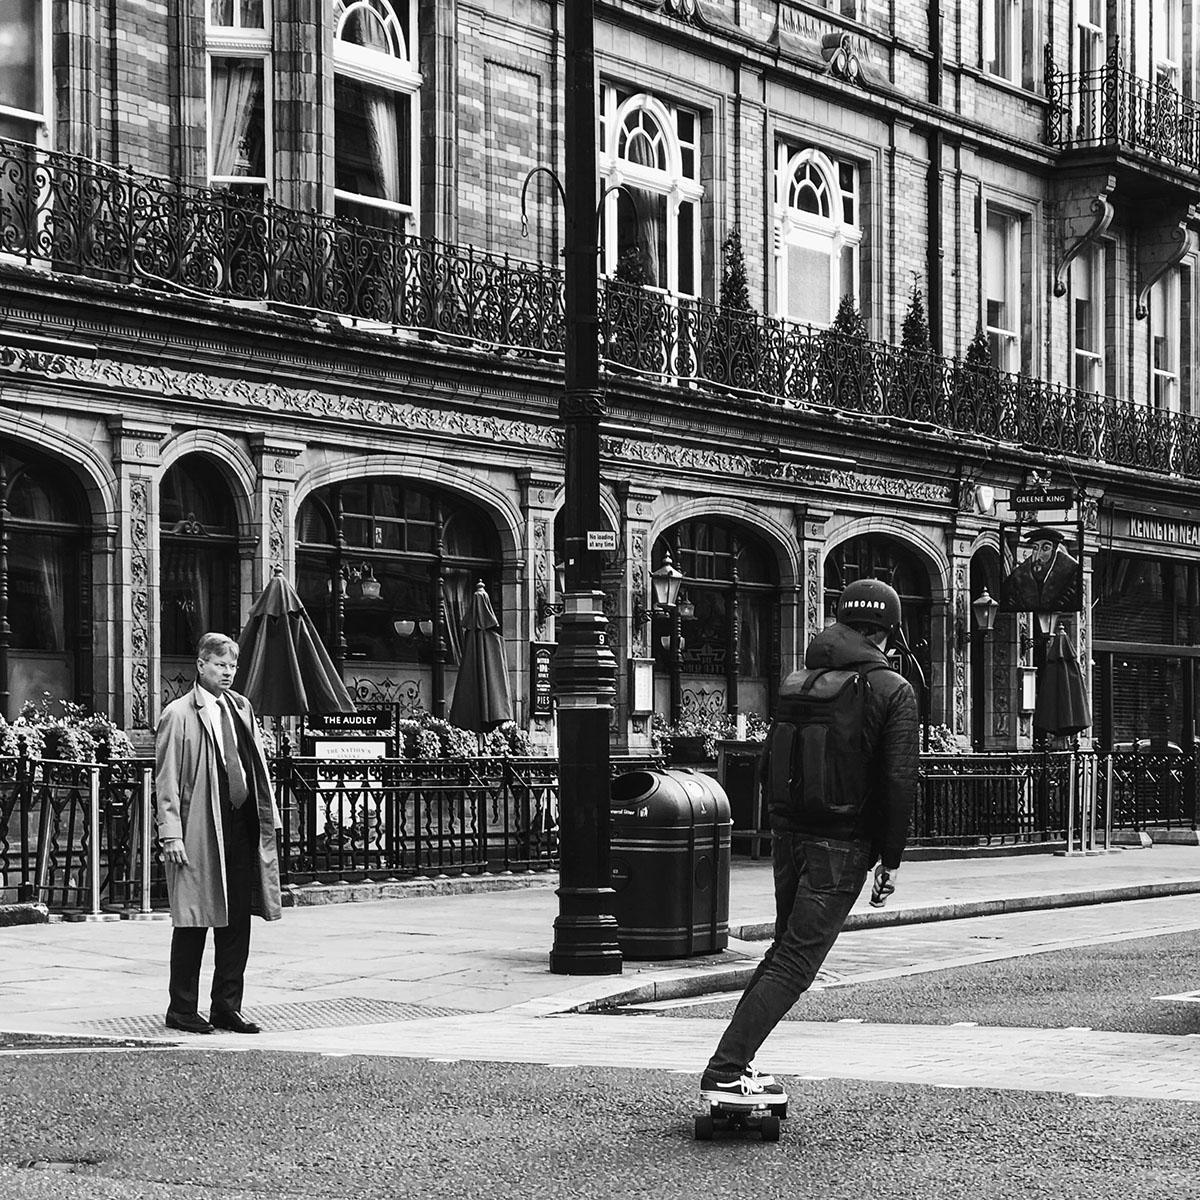 CaraGallardoWeil_A London Moment.jpg